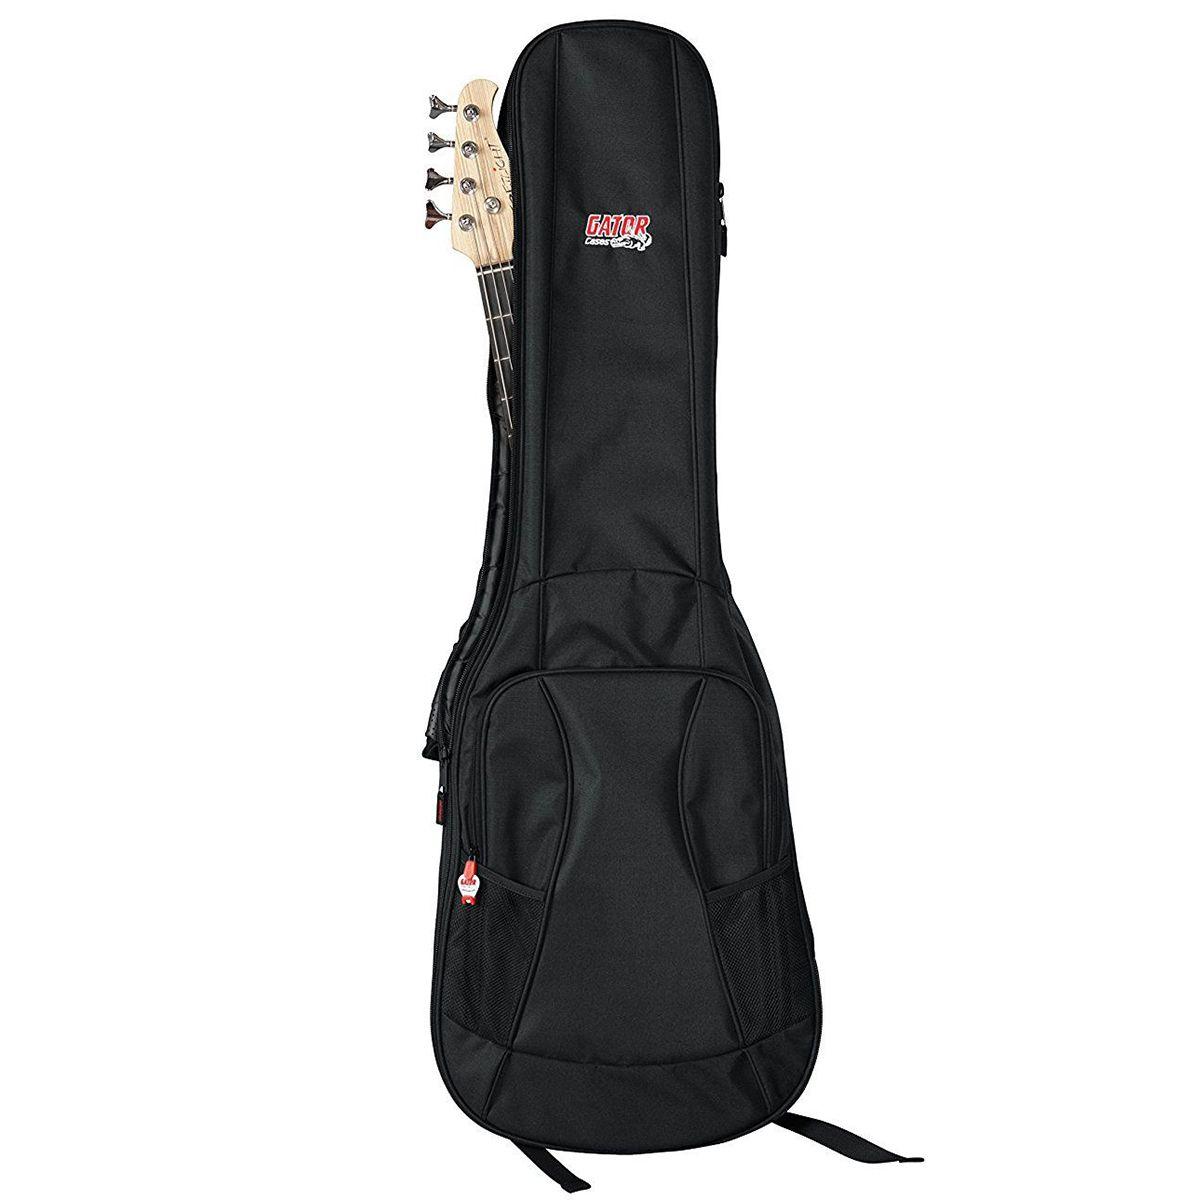 Capa Gator GB 4G Bass para Contrabaixo